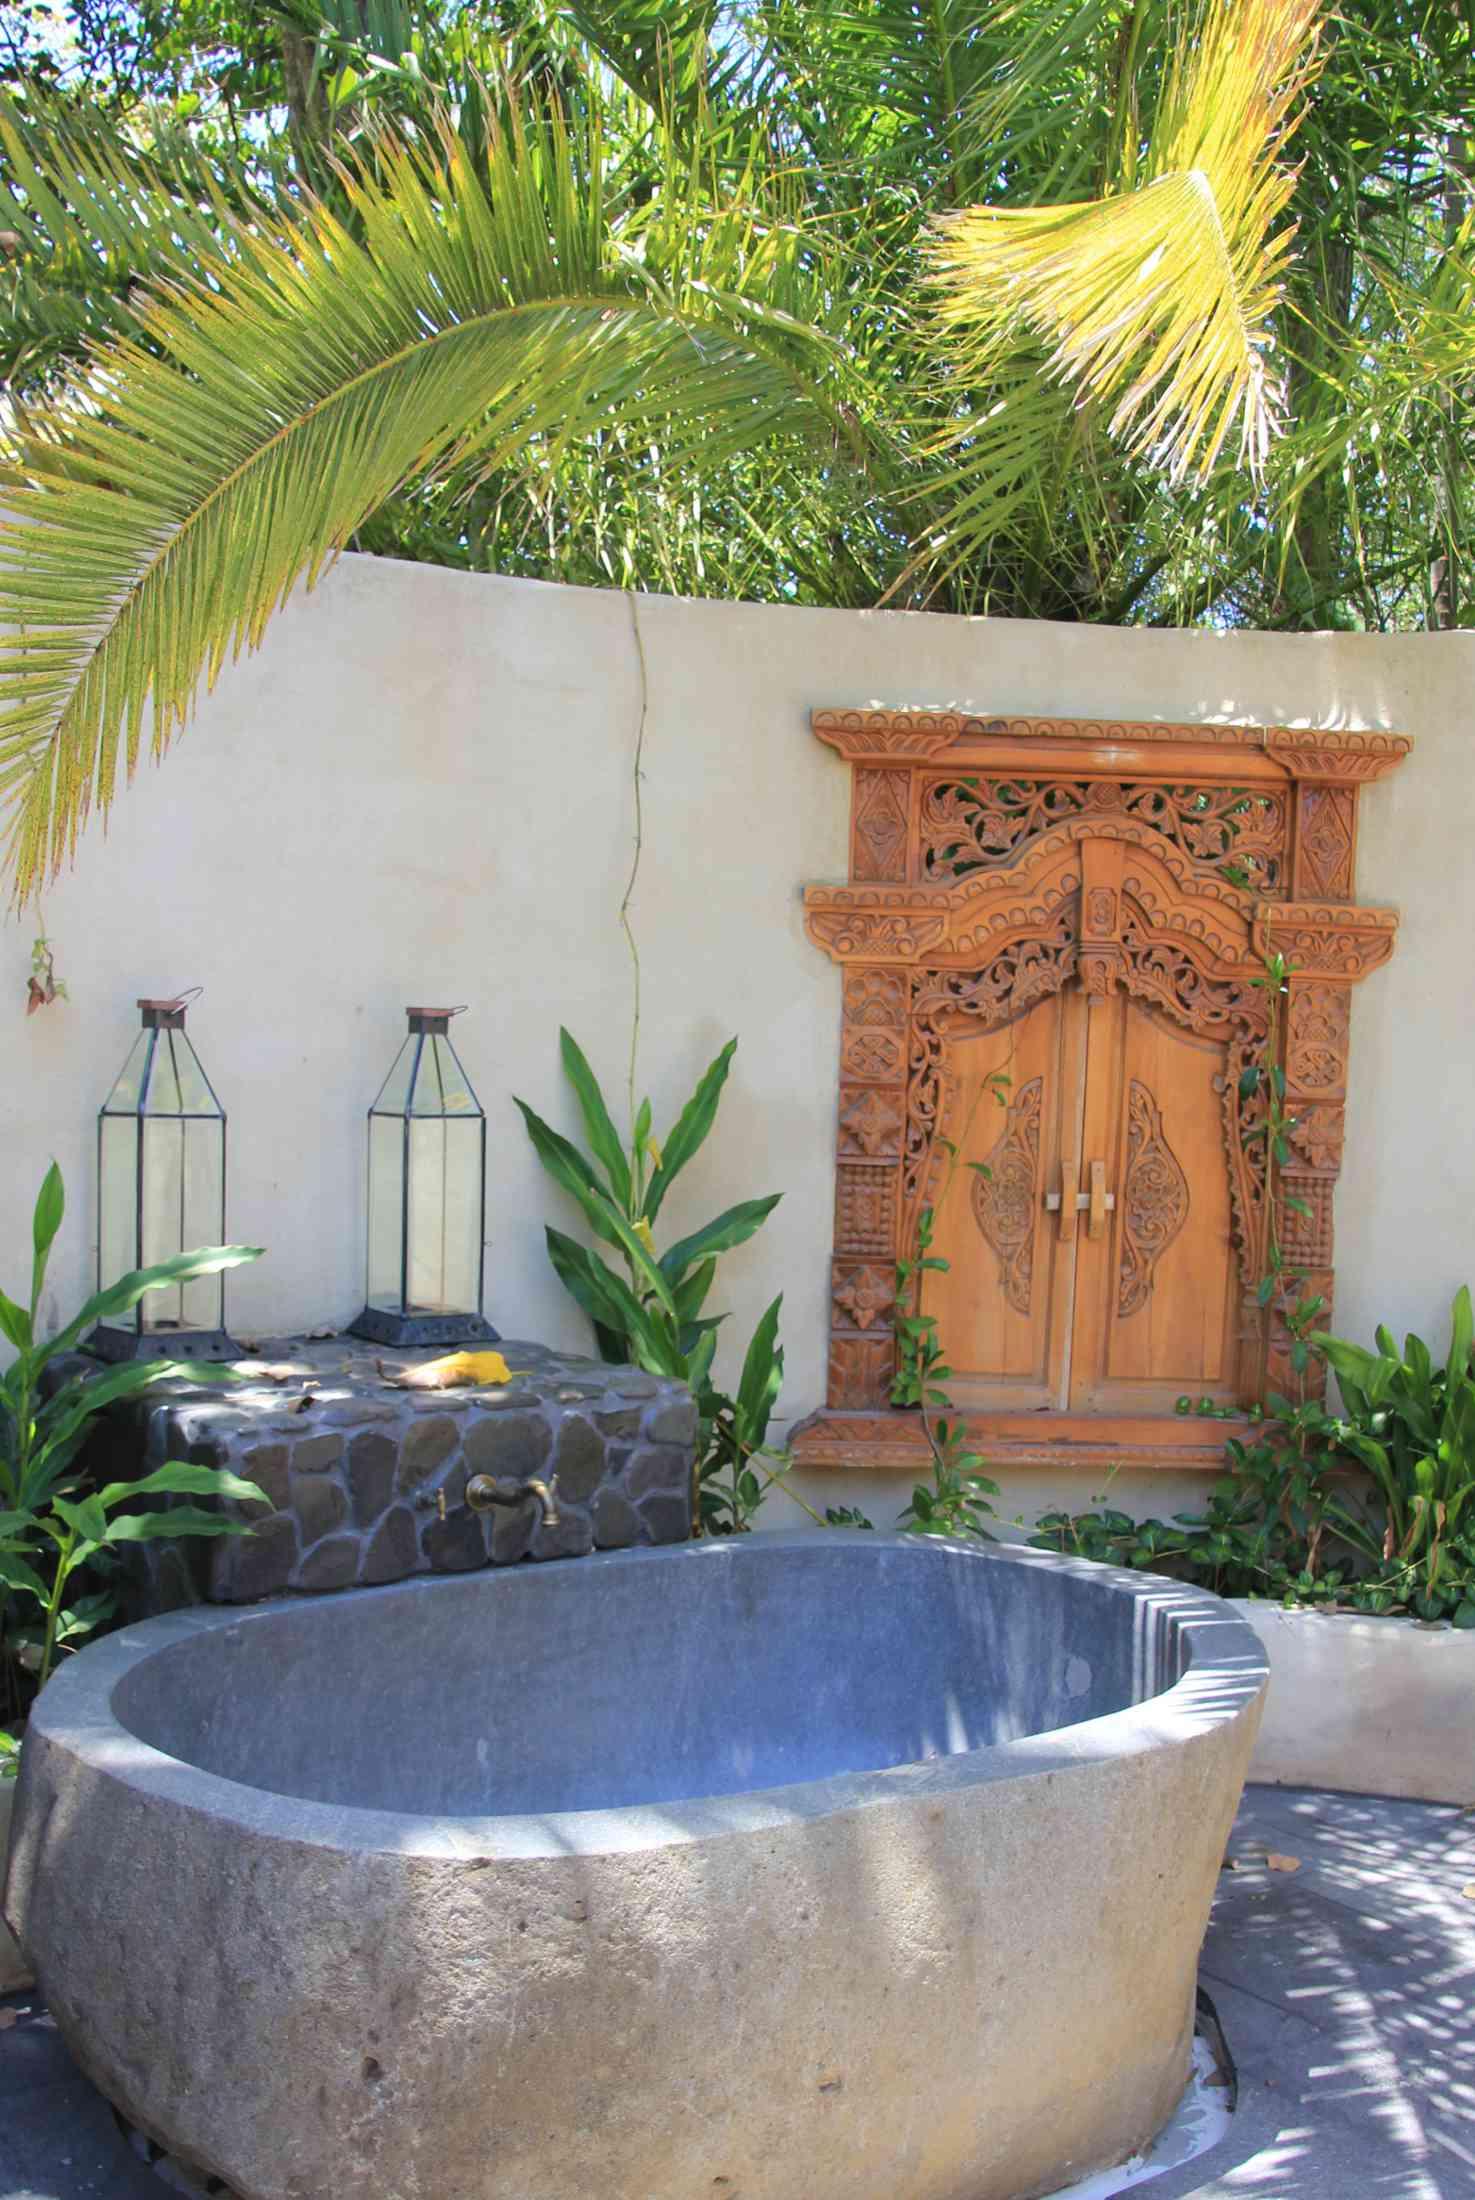 Balinese style outdoor bathroom